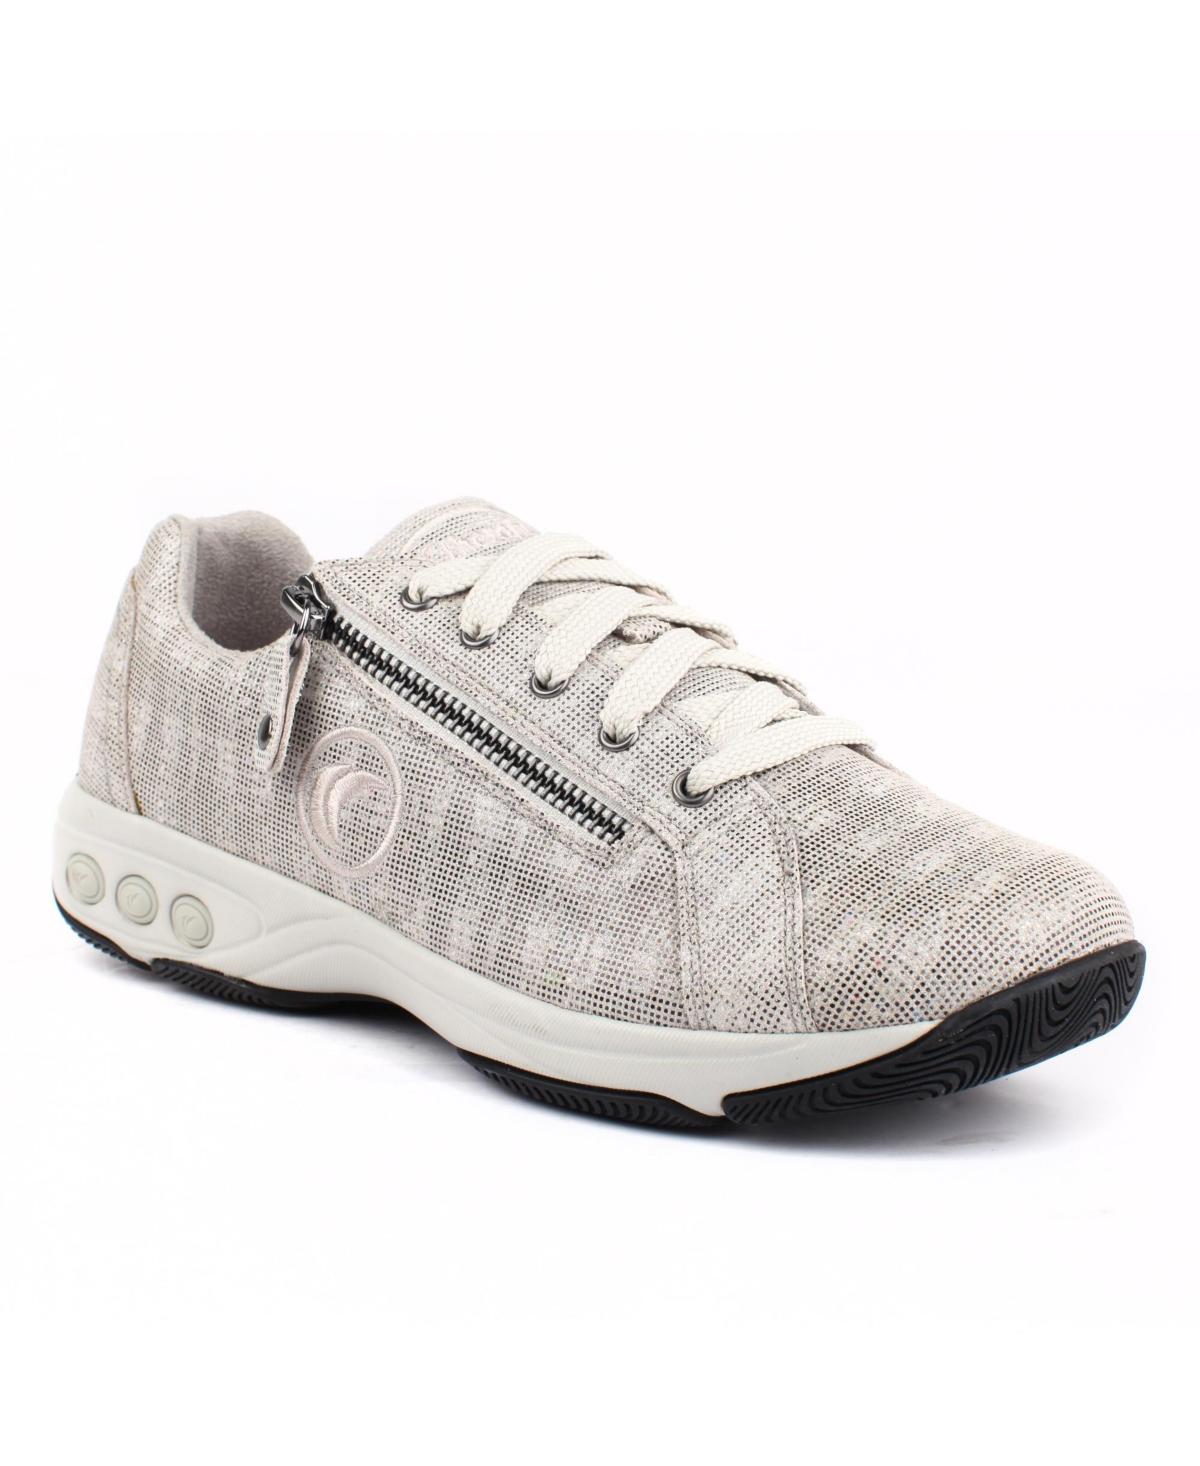 Therafit Shoe Fransesca Sport Shoe Women's Shoes